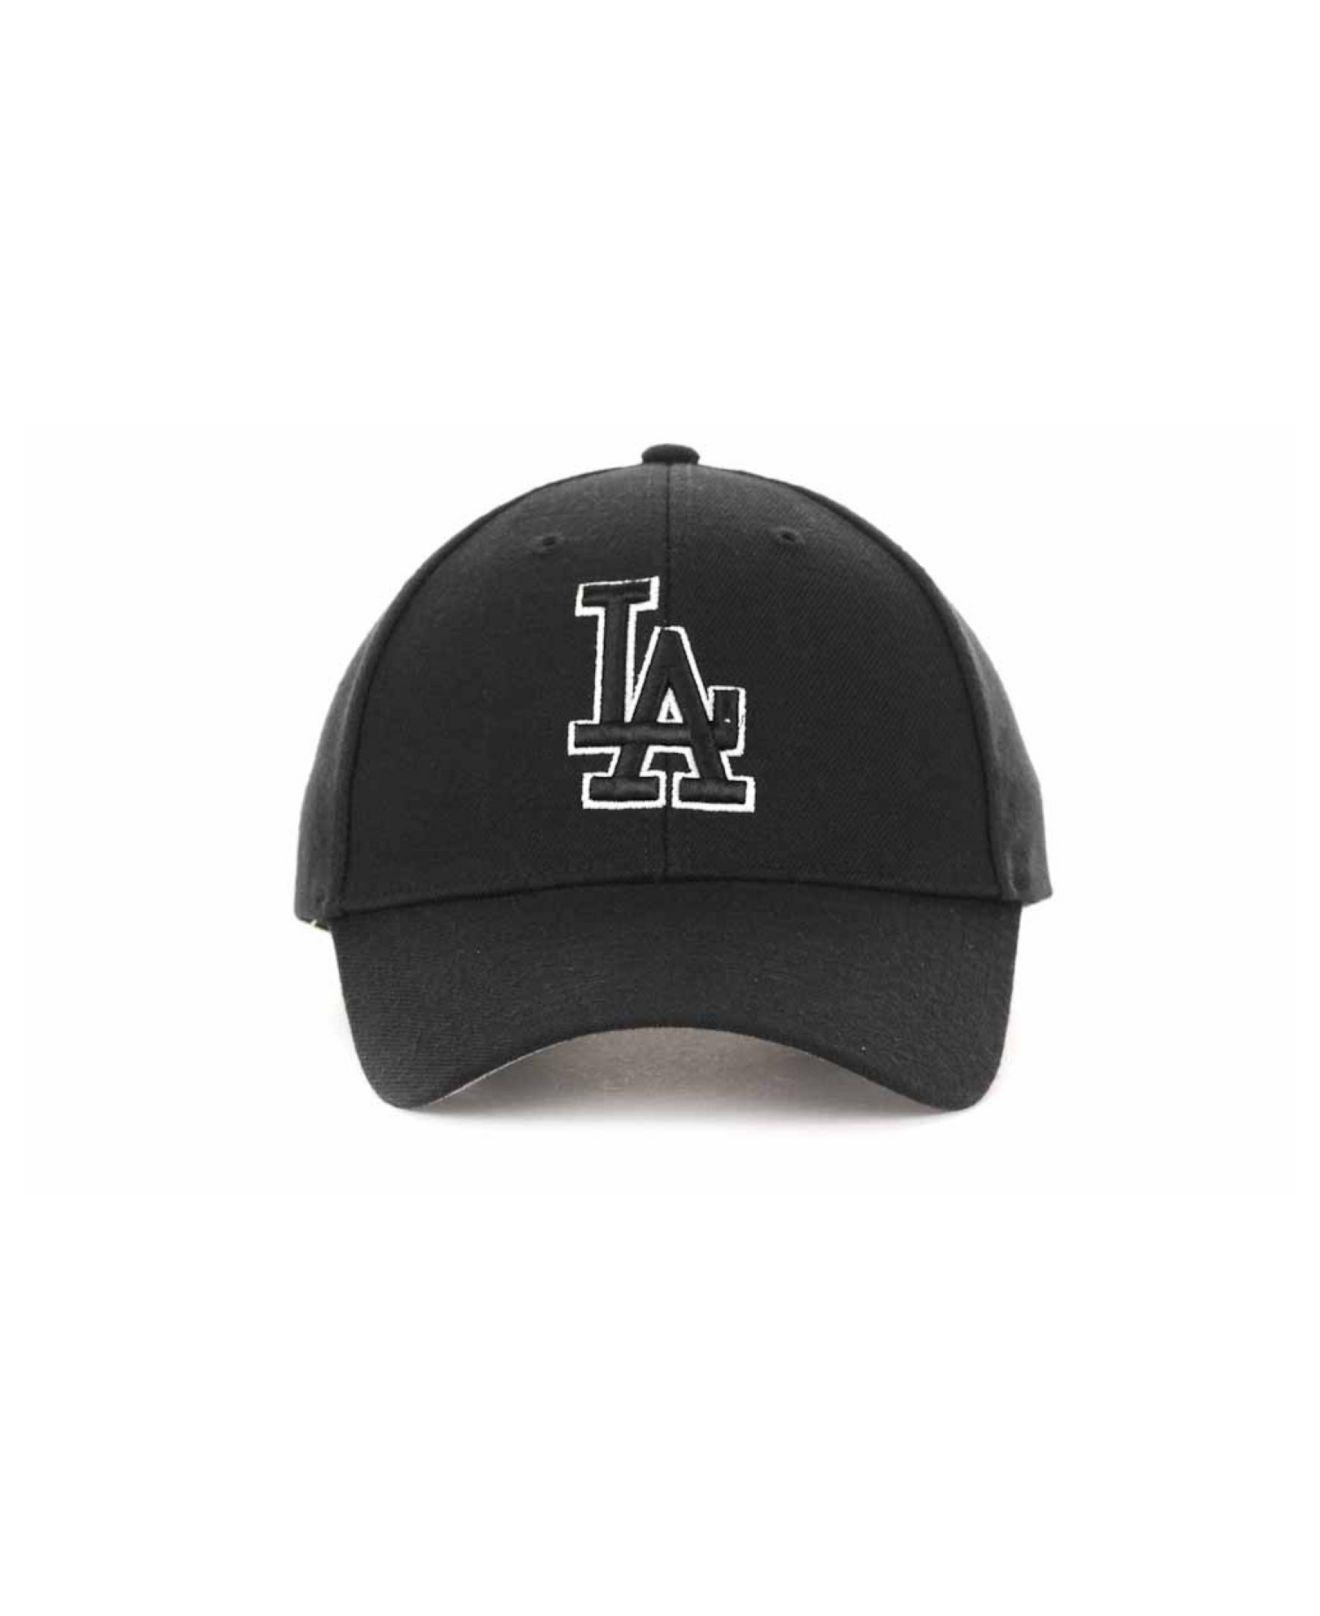 Lyst - 47 Brand Los Angeles Dodgers Mvp Curved Cap in Black 72476b6c937c